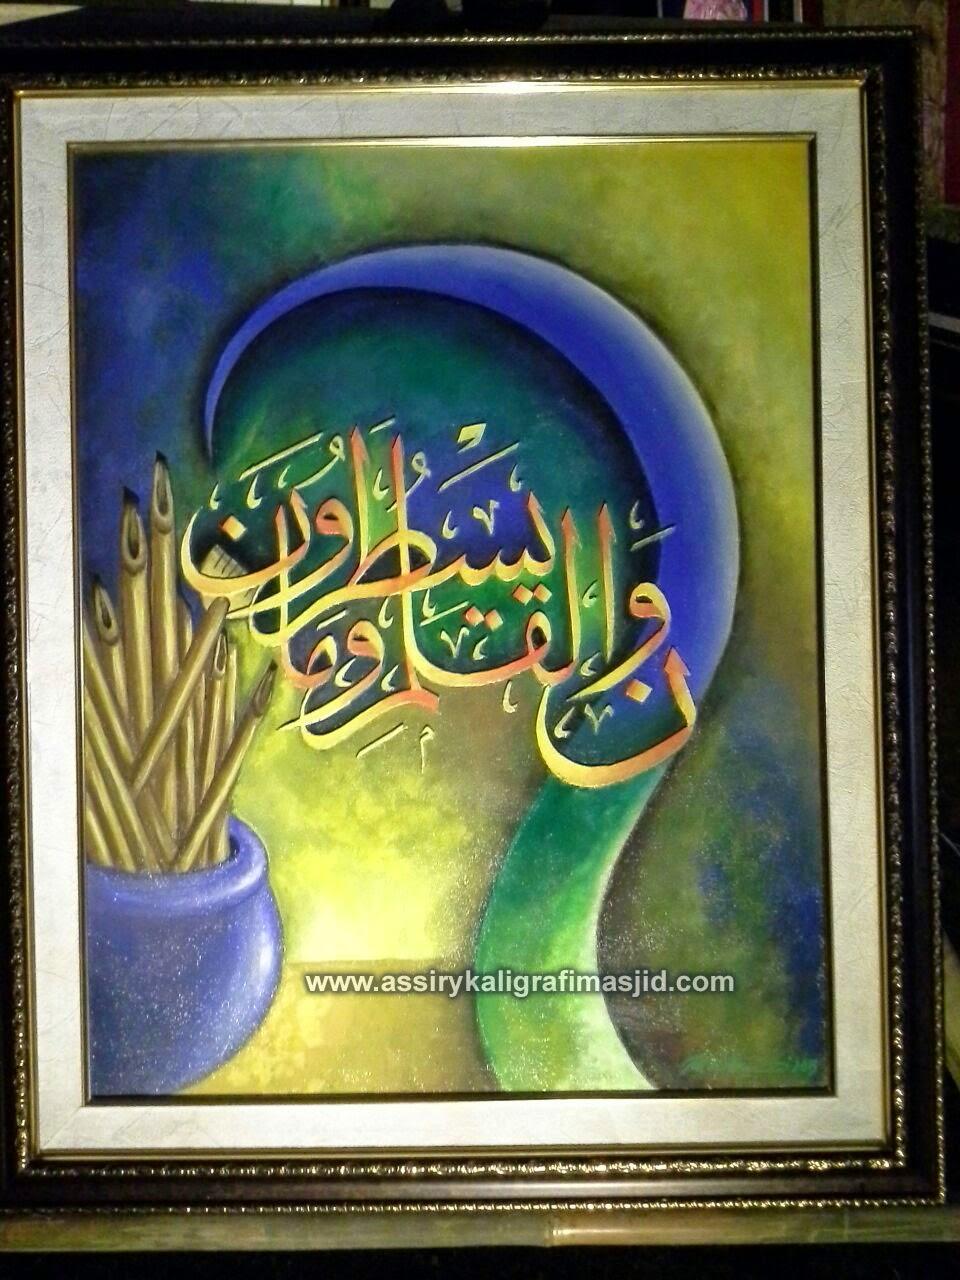 Kaligrafi Lukis Kanvas | CV. ASSIRY ART